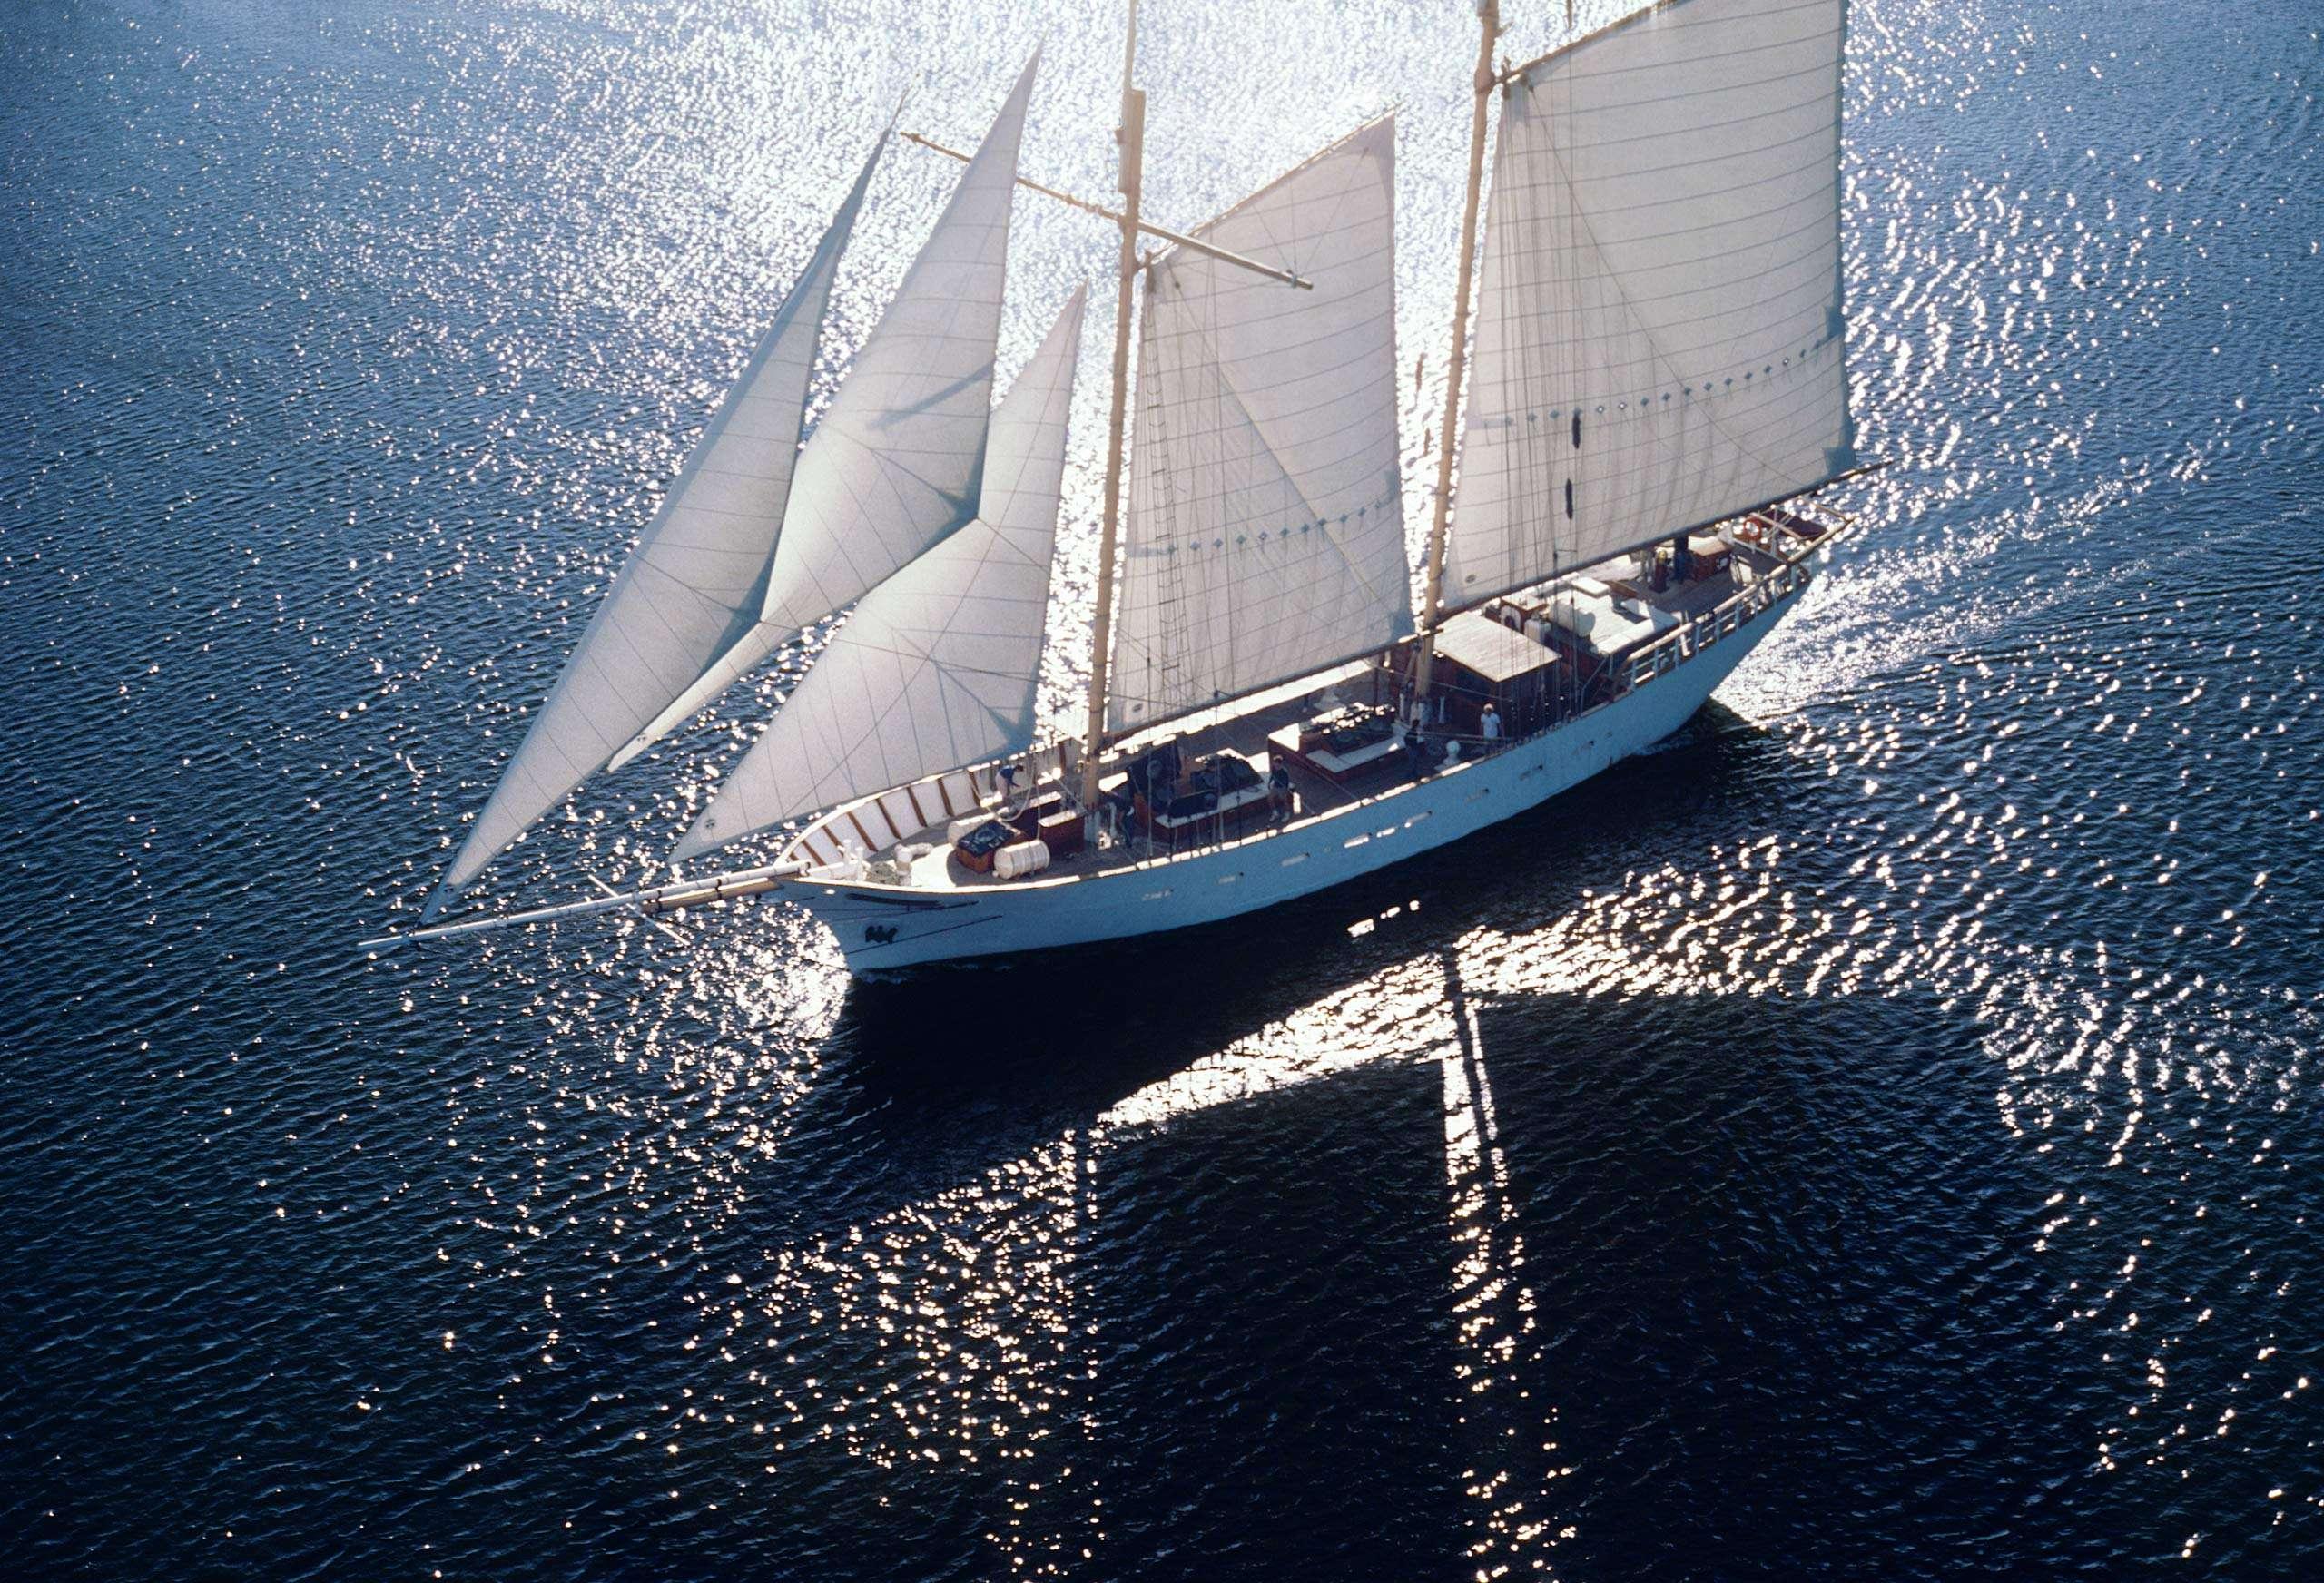 PORTFOLIO - Sailing - Tall Ships #15-PCG074